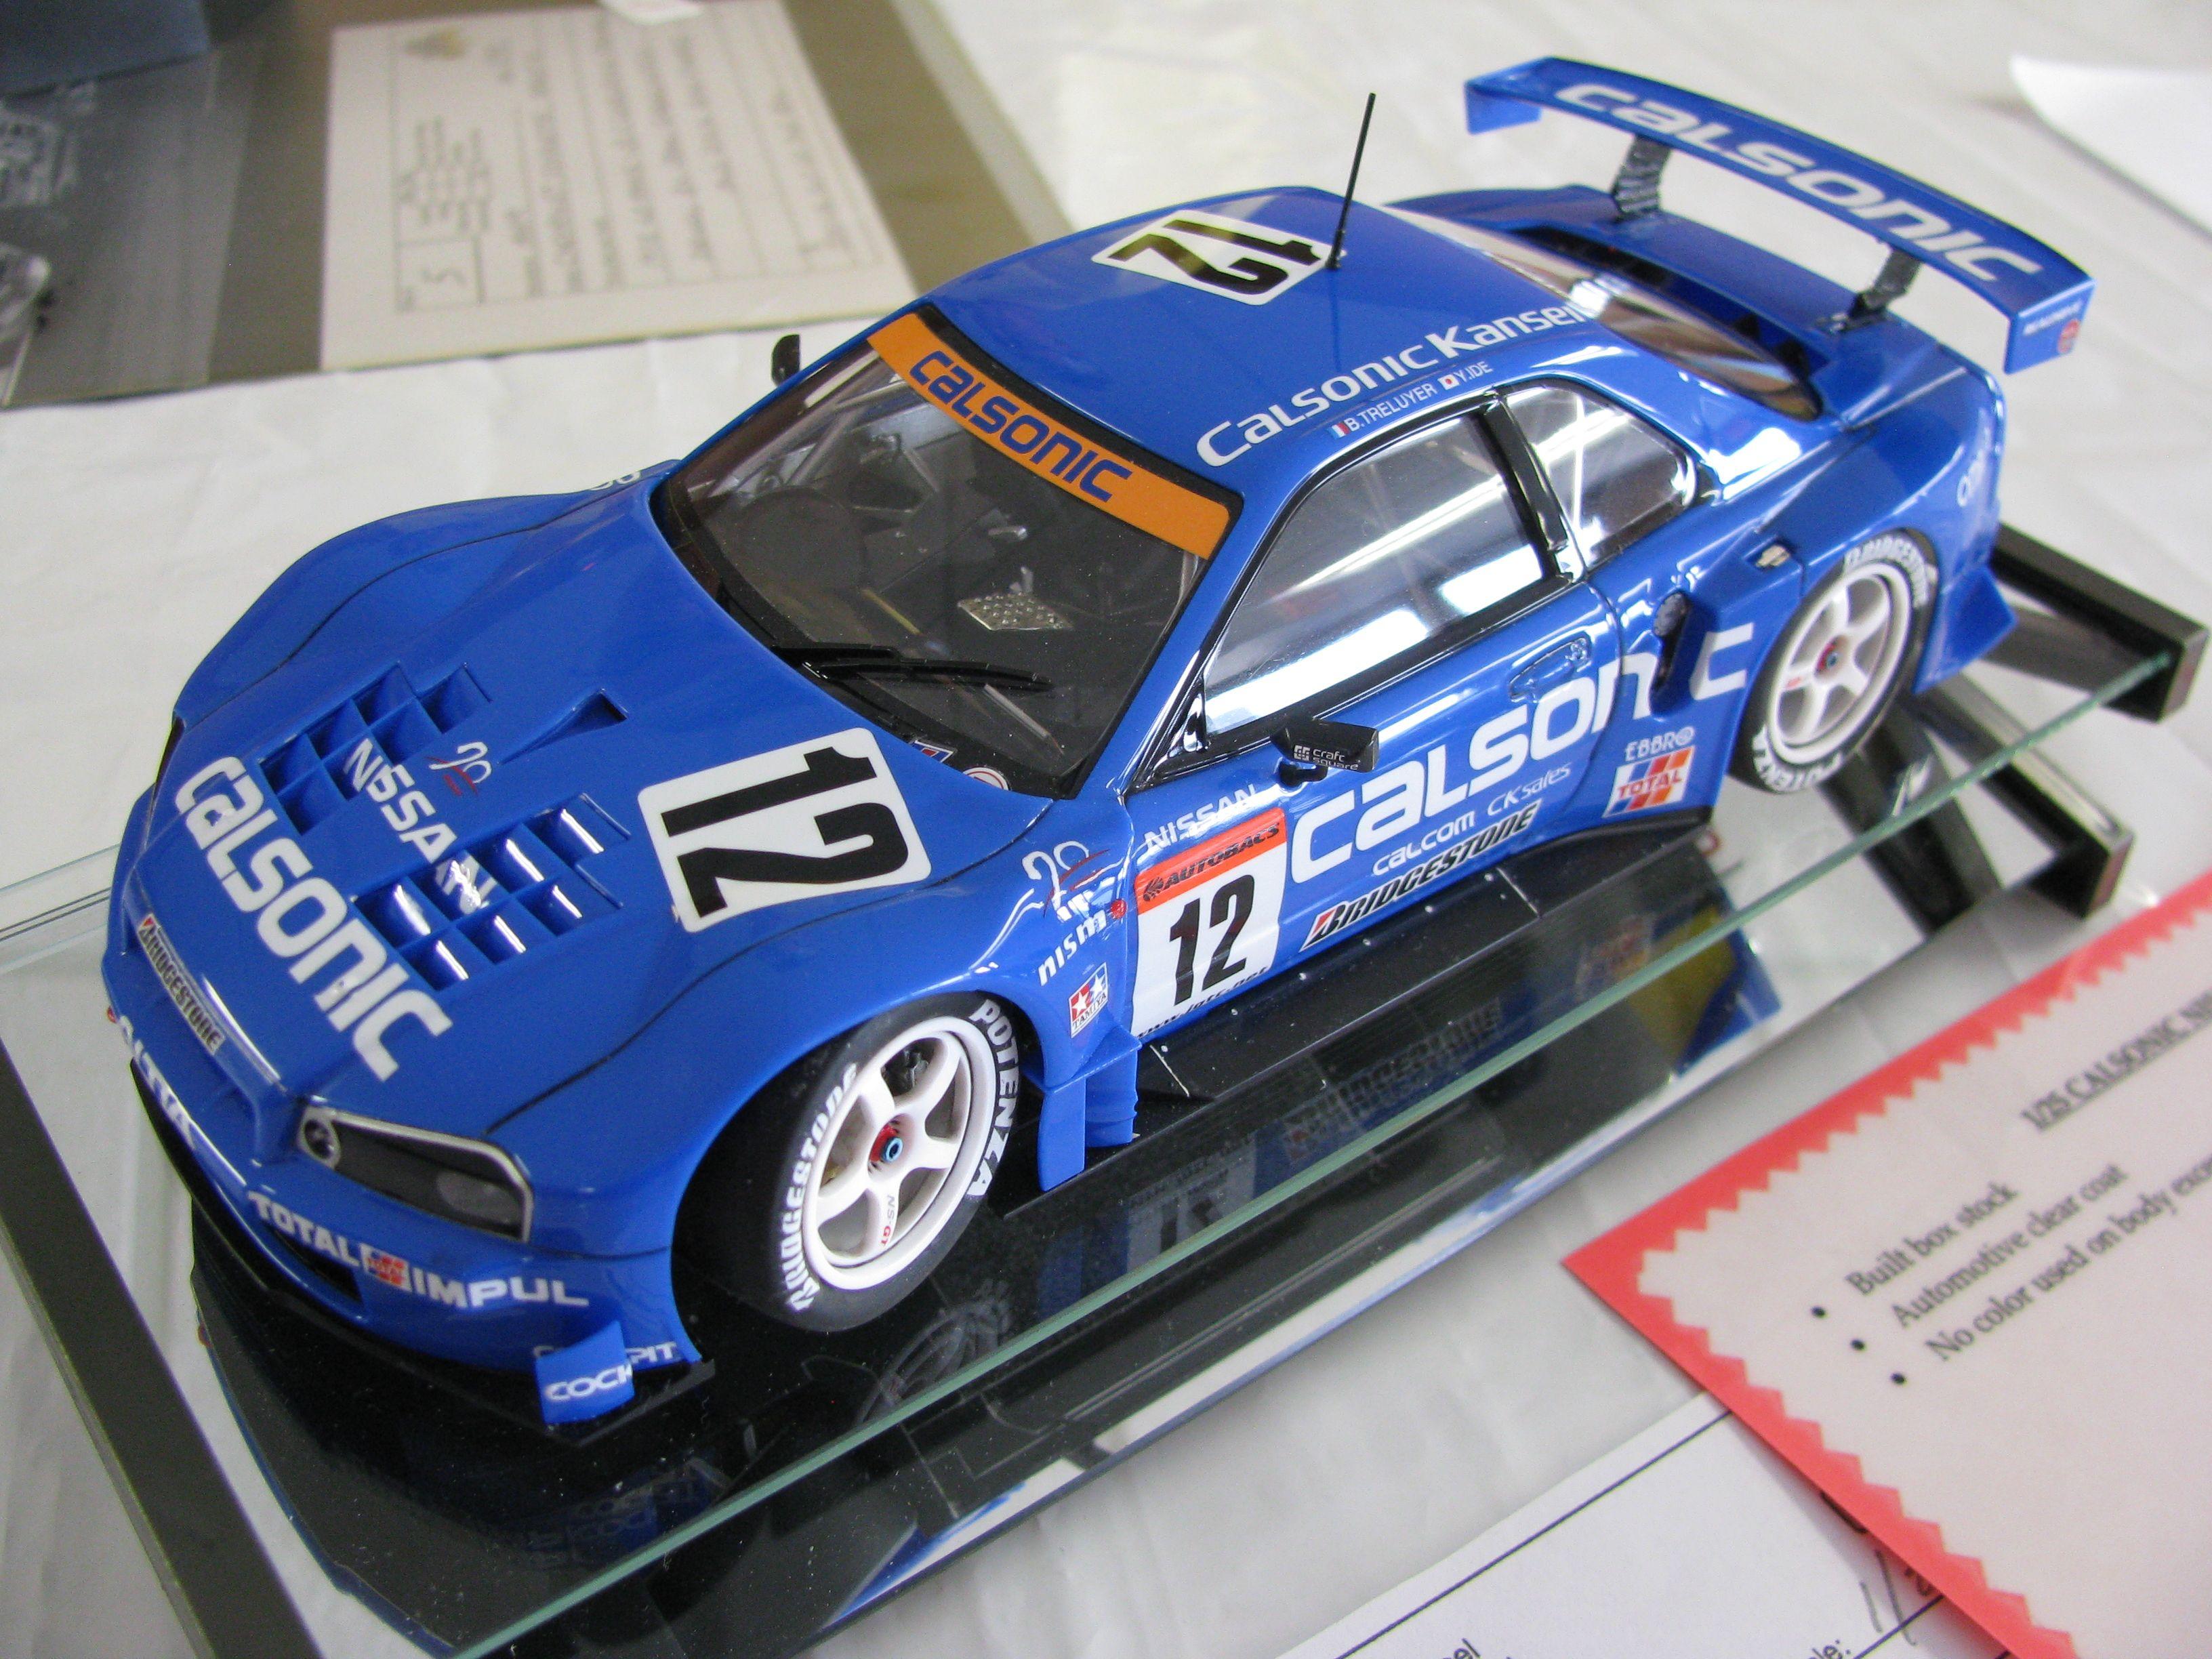 Nissan R-34 Skyline JGTC 1:25 scale Tamiya model As driven ...